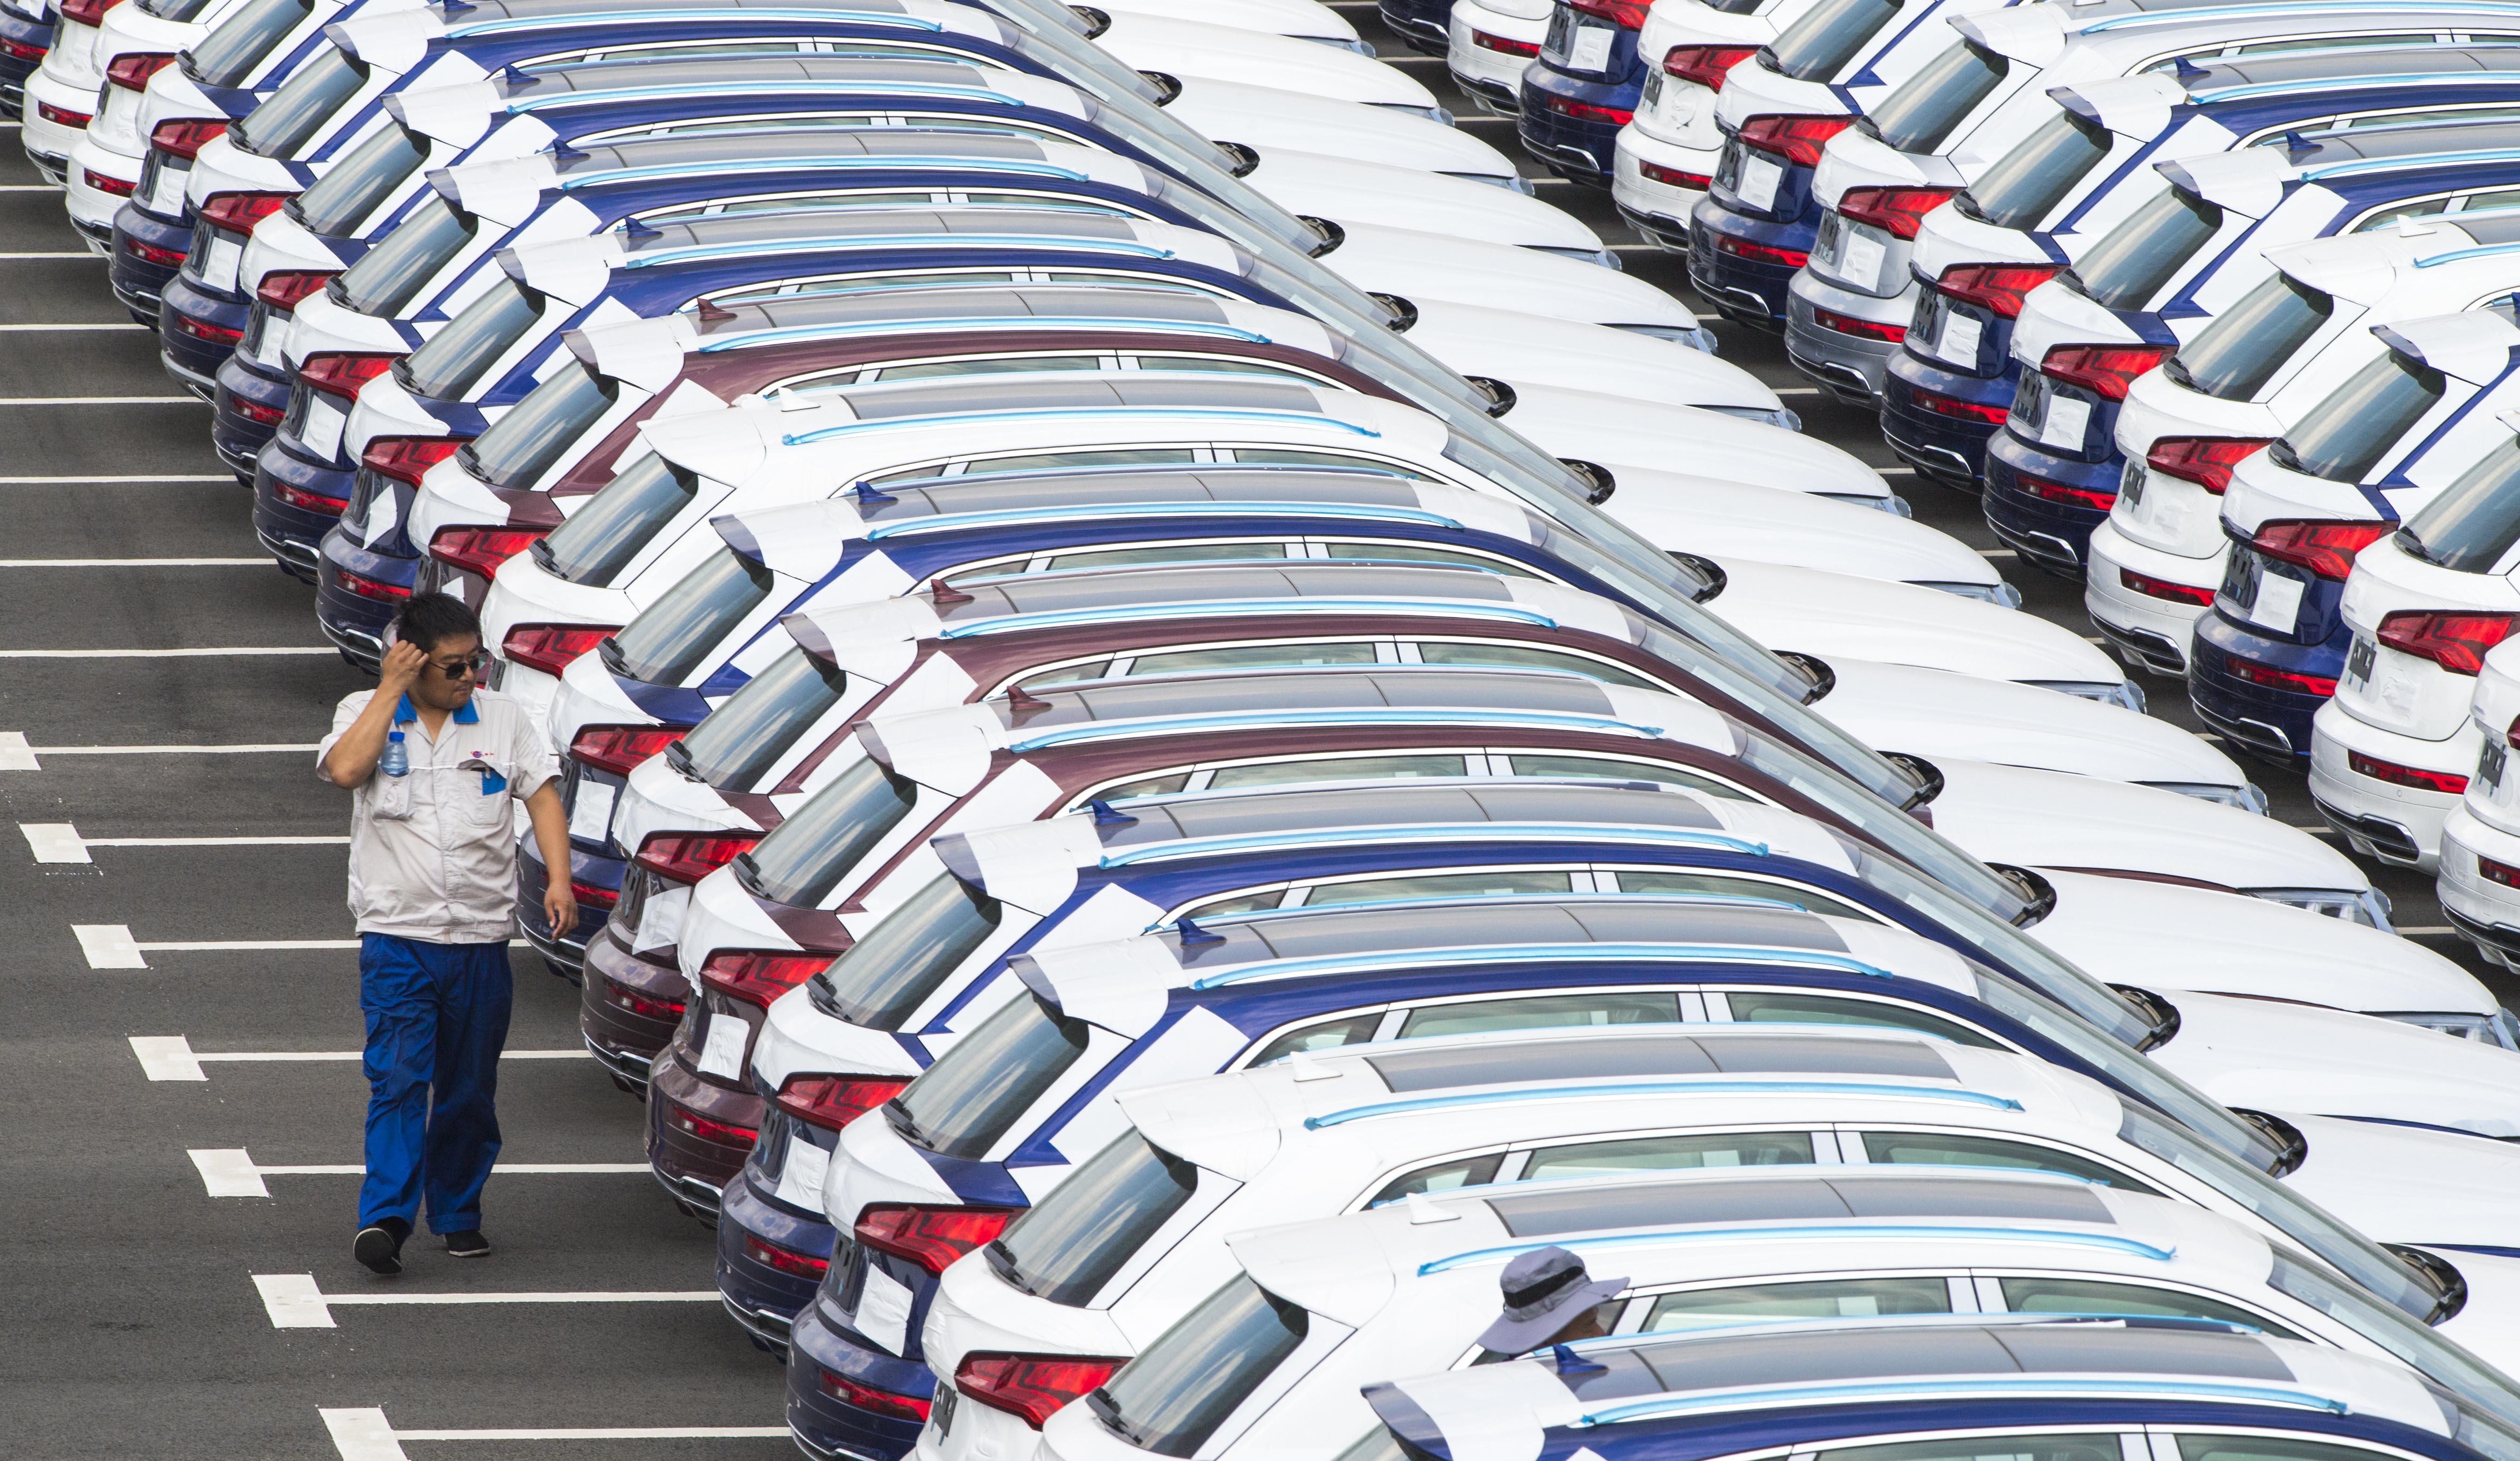 中国の自動車販売台数、上半期は前年同期比12.4%減